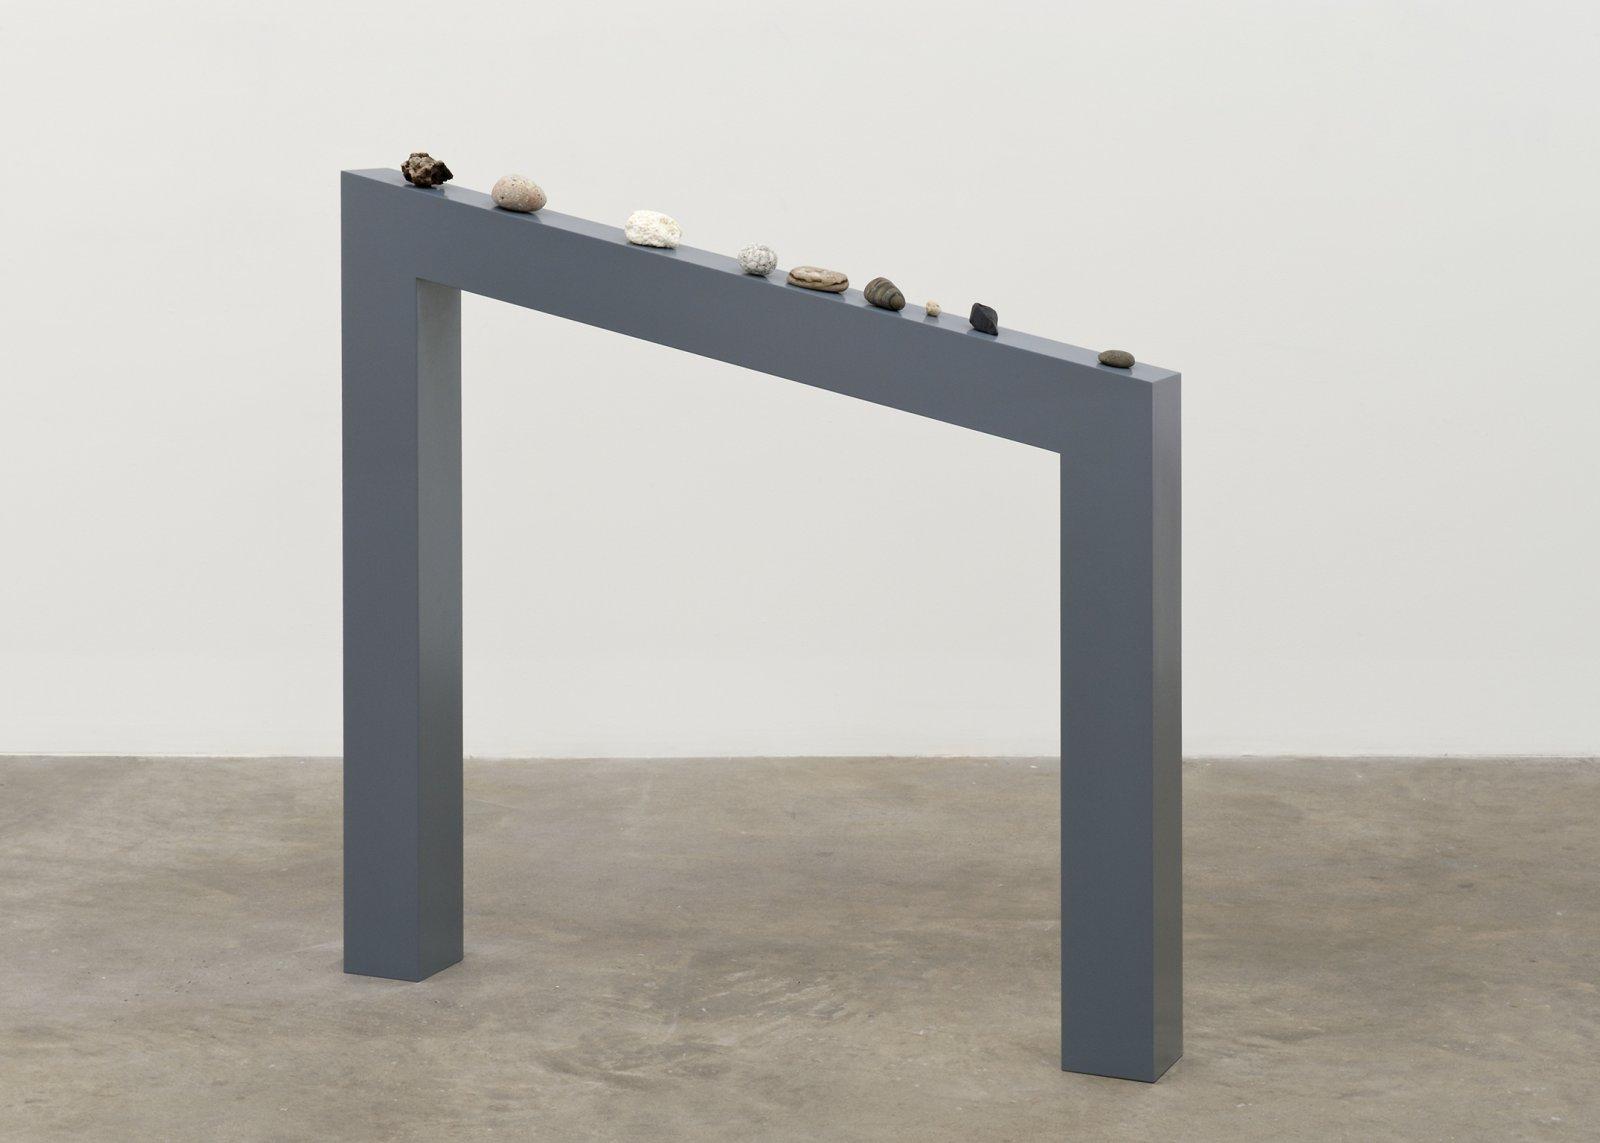 Judy Radul, Motivation, 2012, rocks, wood 45 x 44 x 5 in. (114 x 110 x 11 cm) by Judy Radul